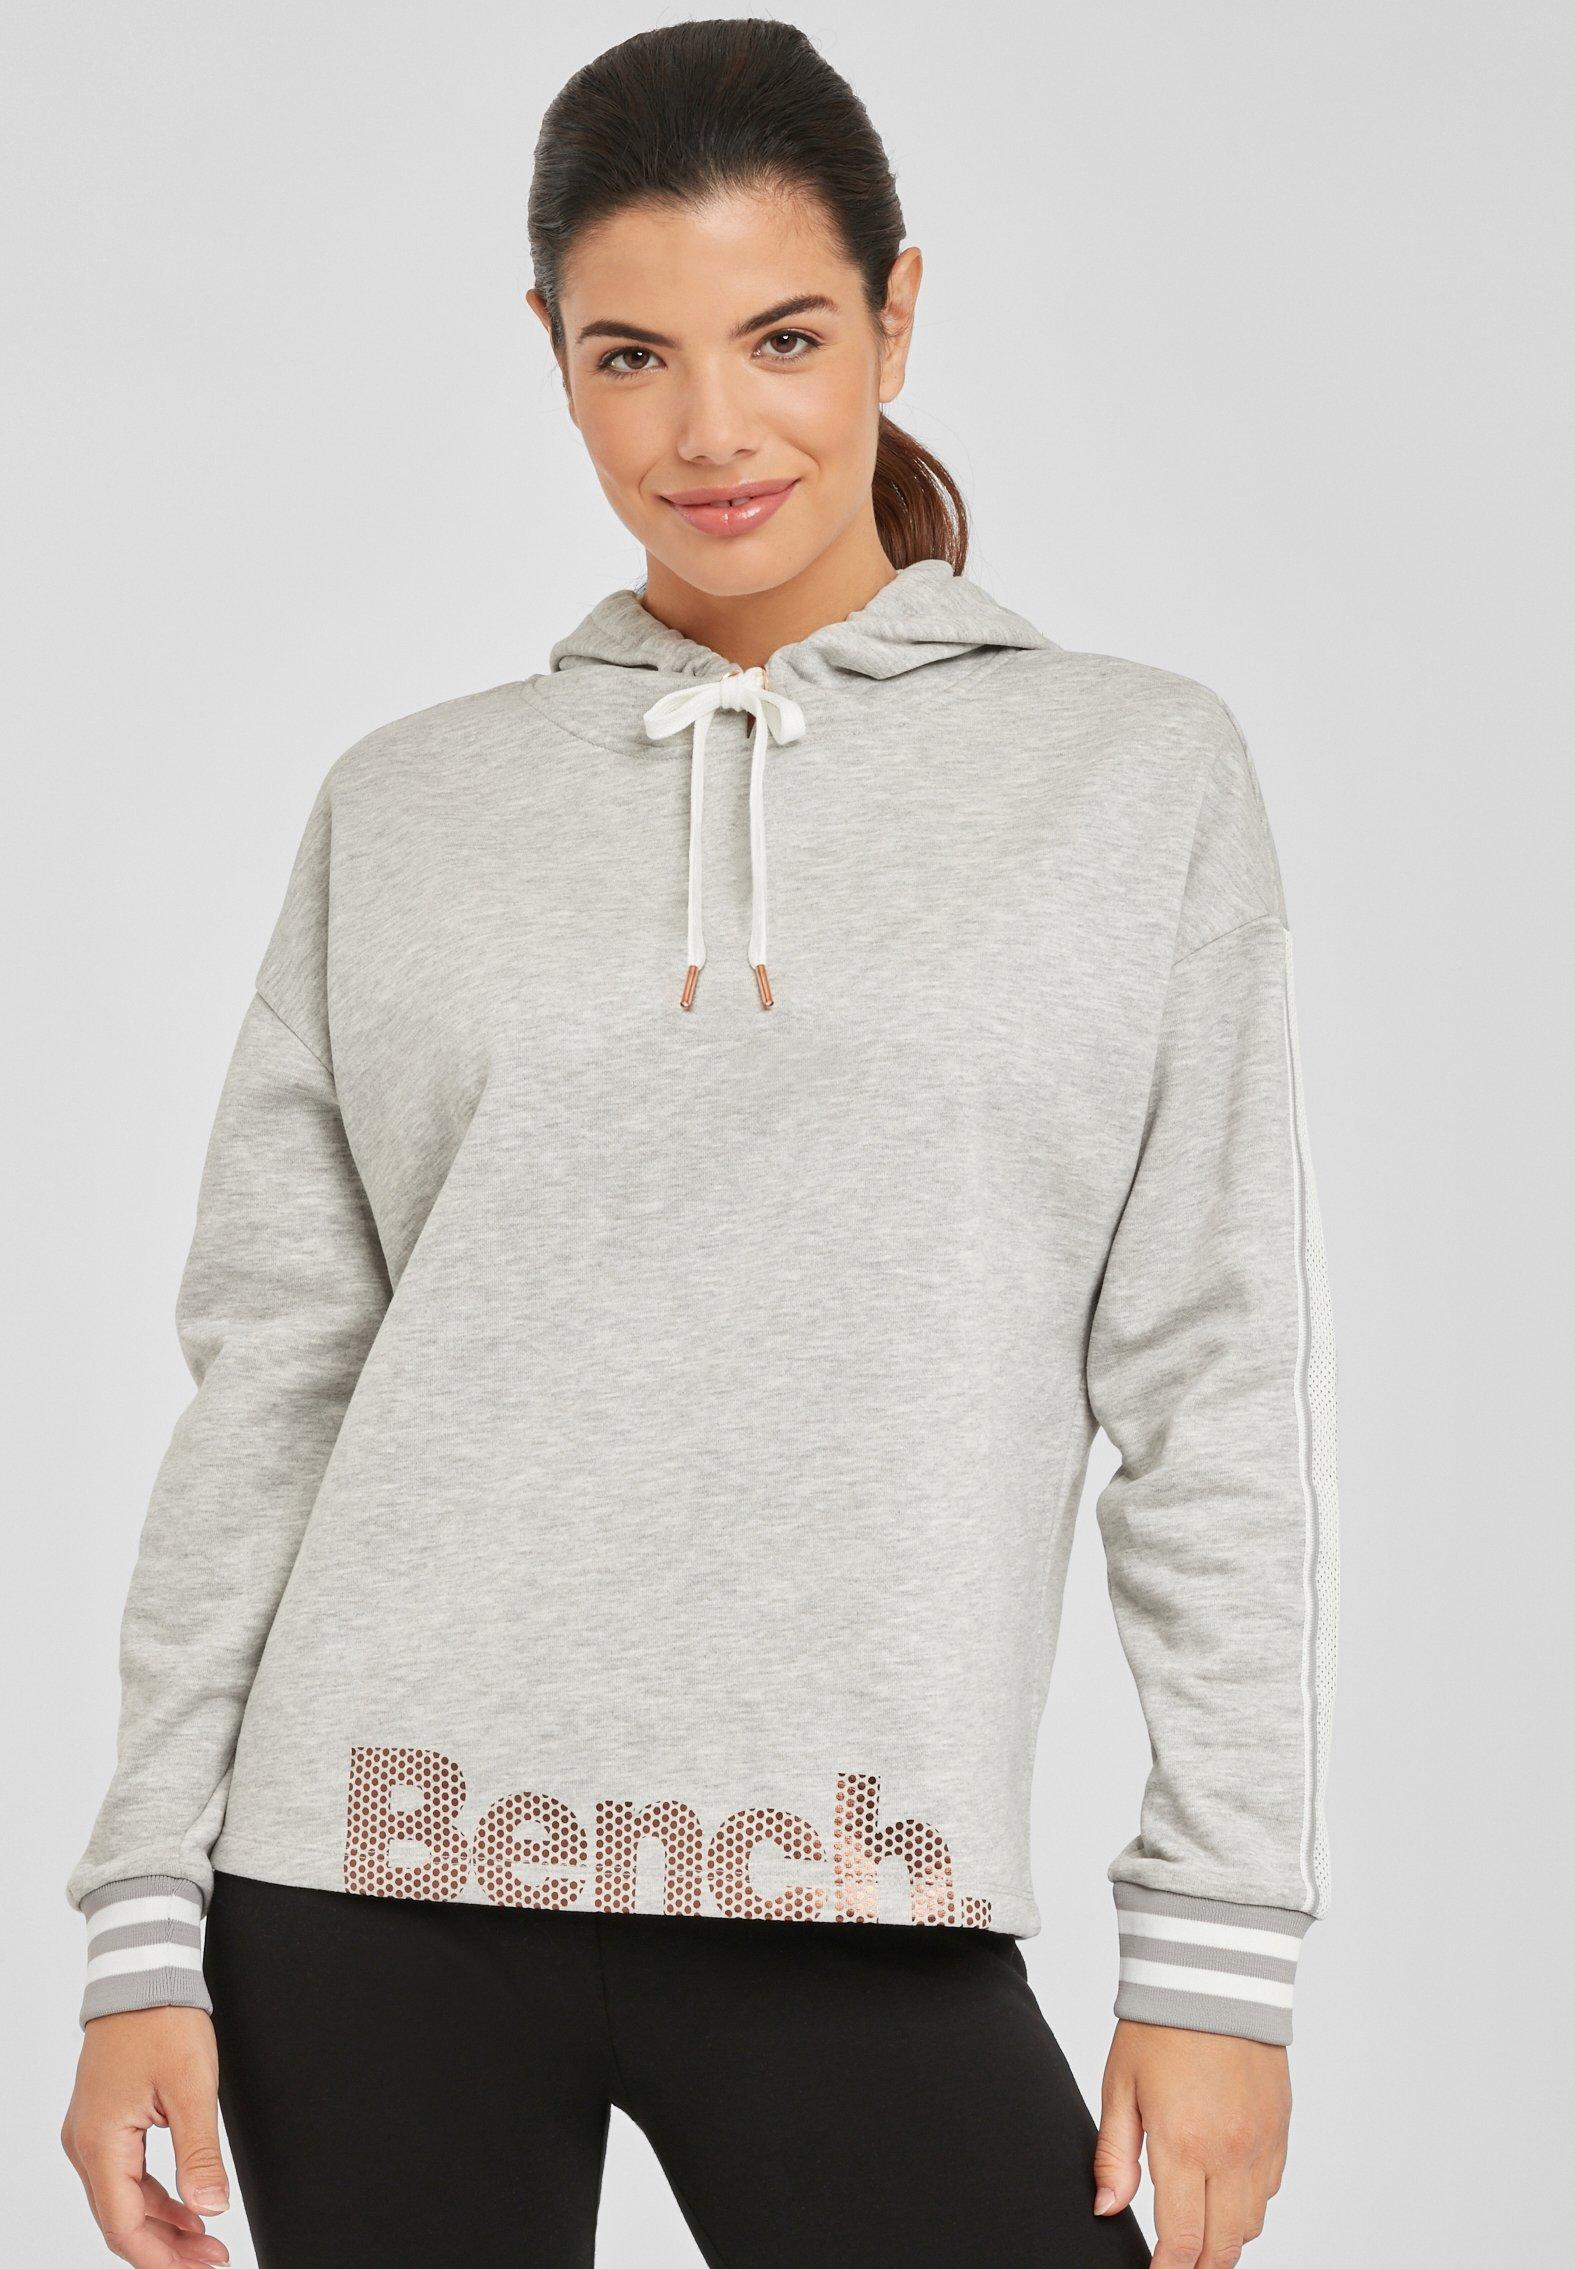 Bench Damen Sweatshirt Gr. XS, Apricot: : Bekleidung